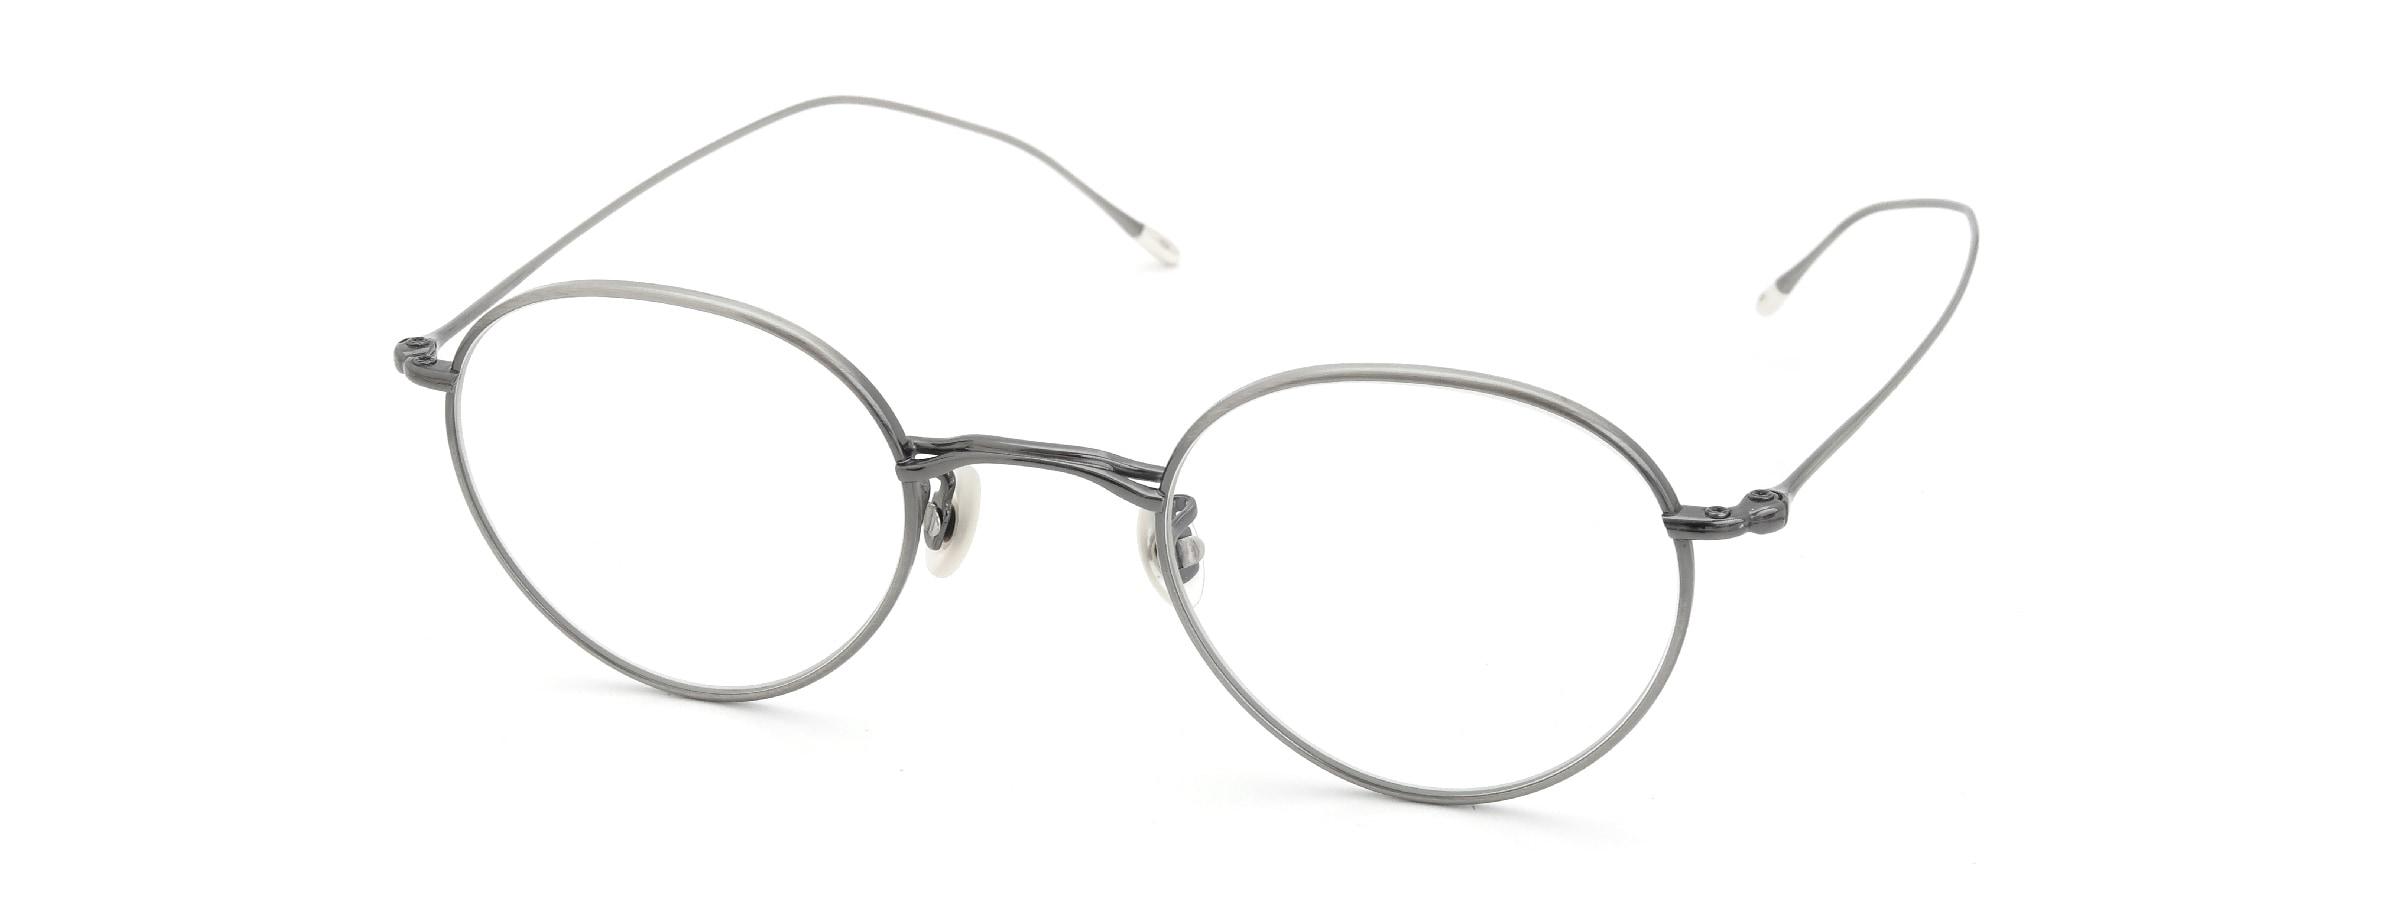 10 eyevan NO.3 45size